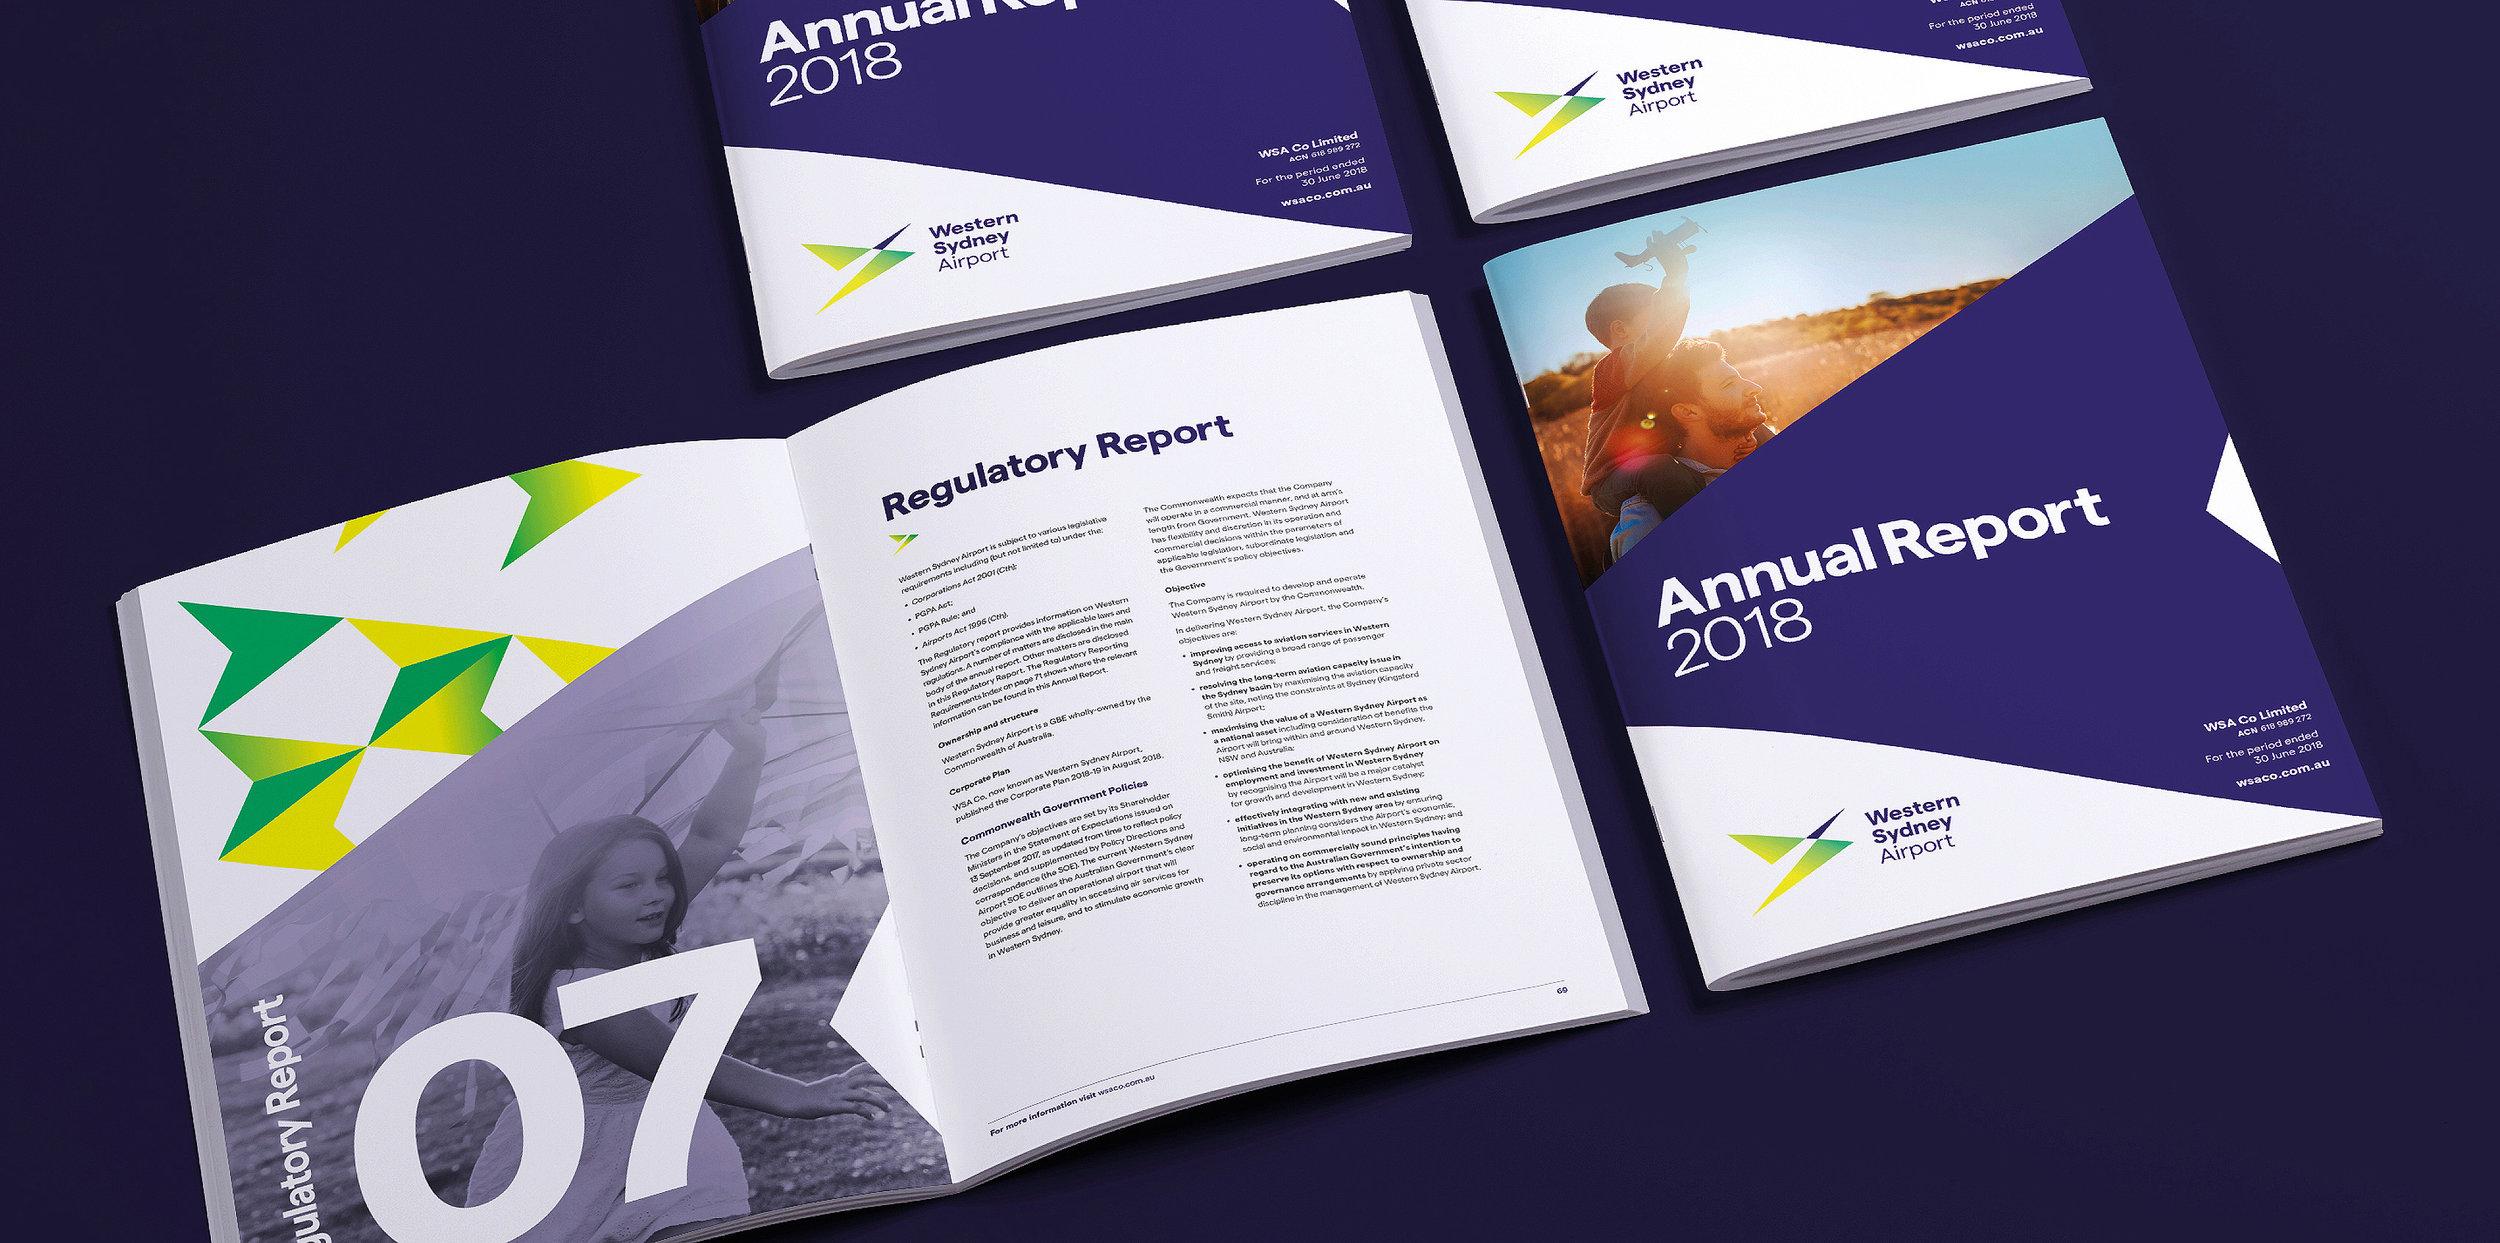 Western-Sydney-Airport-Annual-Report-Design-02.jpg